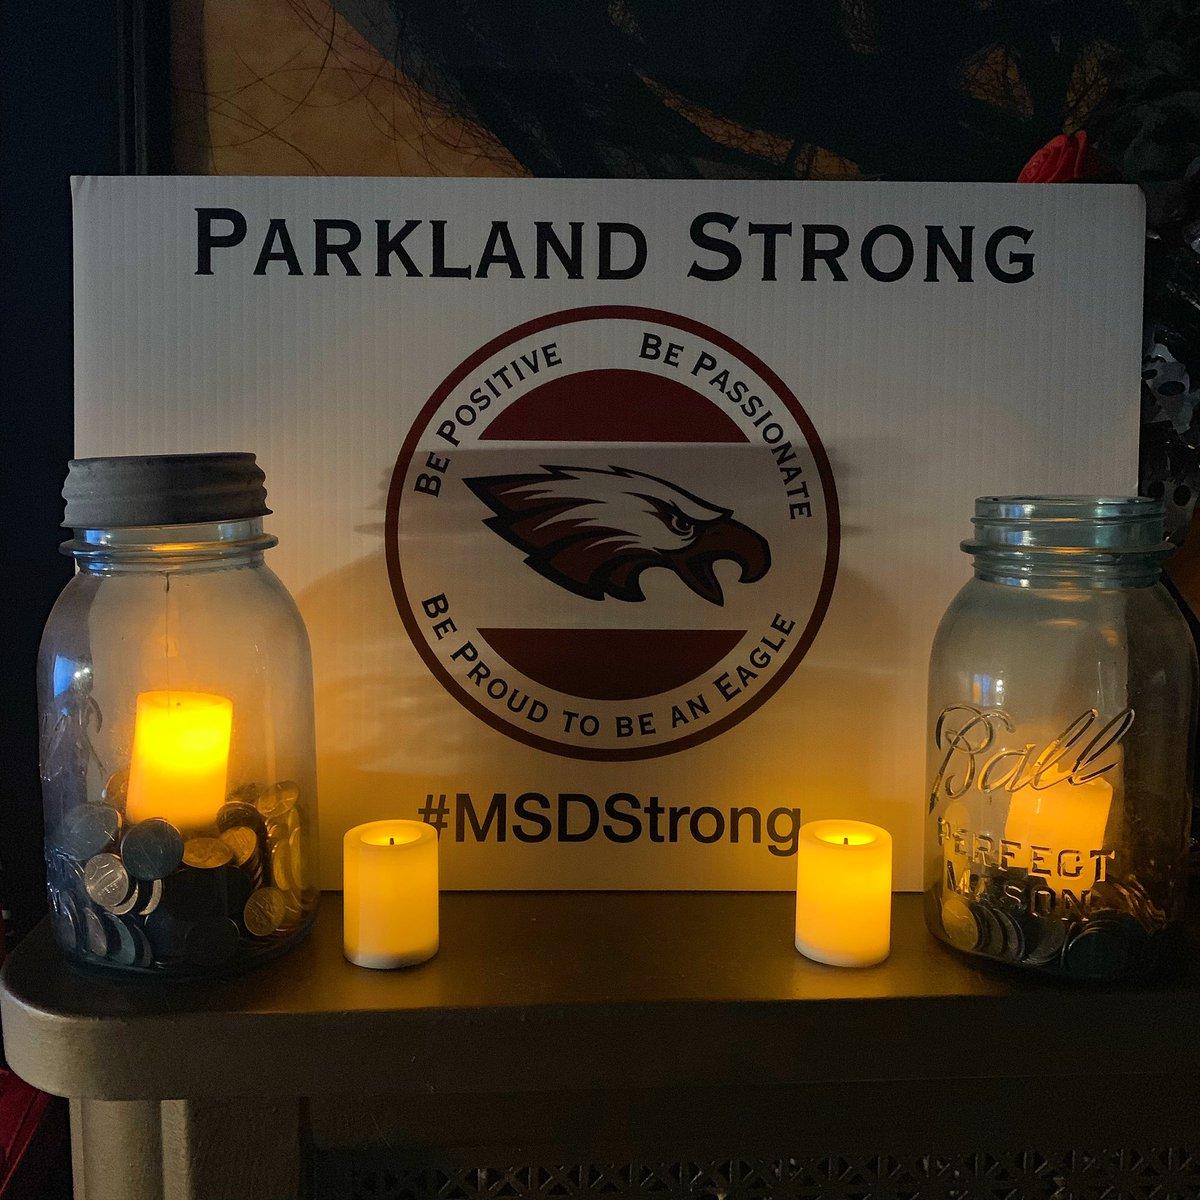 #17Eagles #MSDstrong #ParklandStong #neveragain #classof2003 #msdalumni https://t.co/o5QbRmSHK6